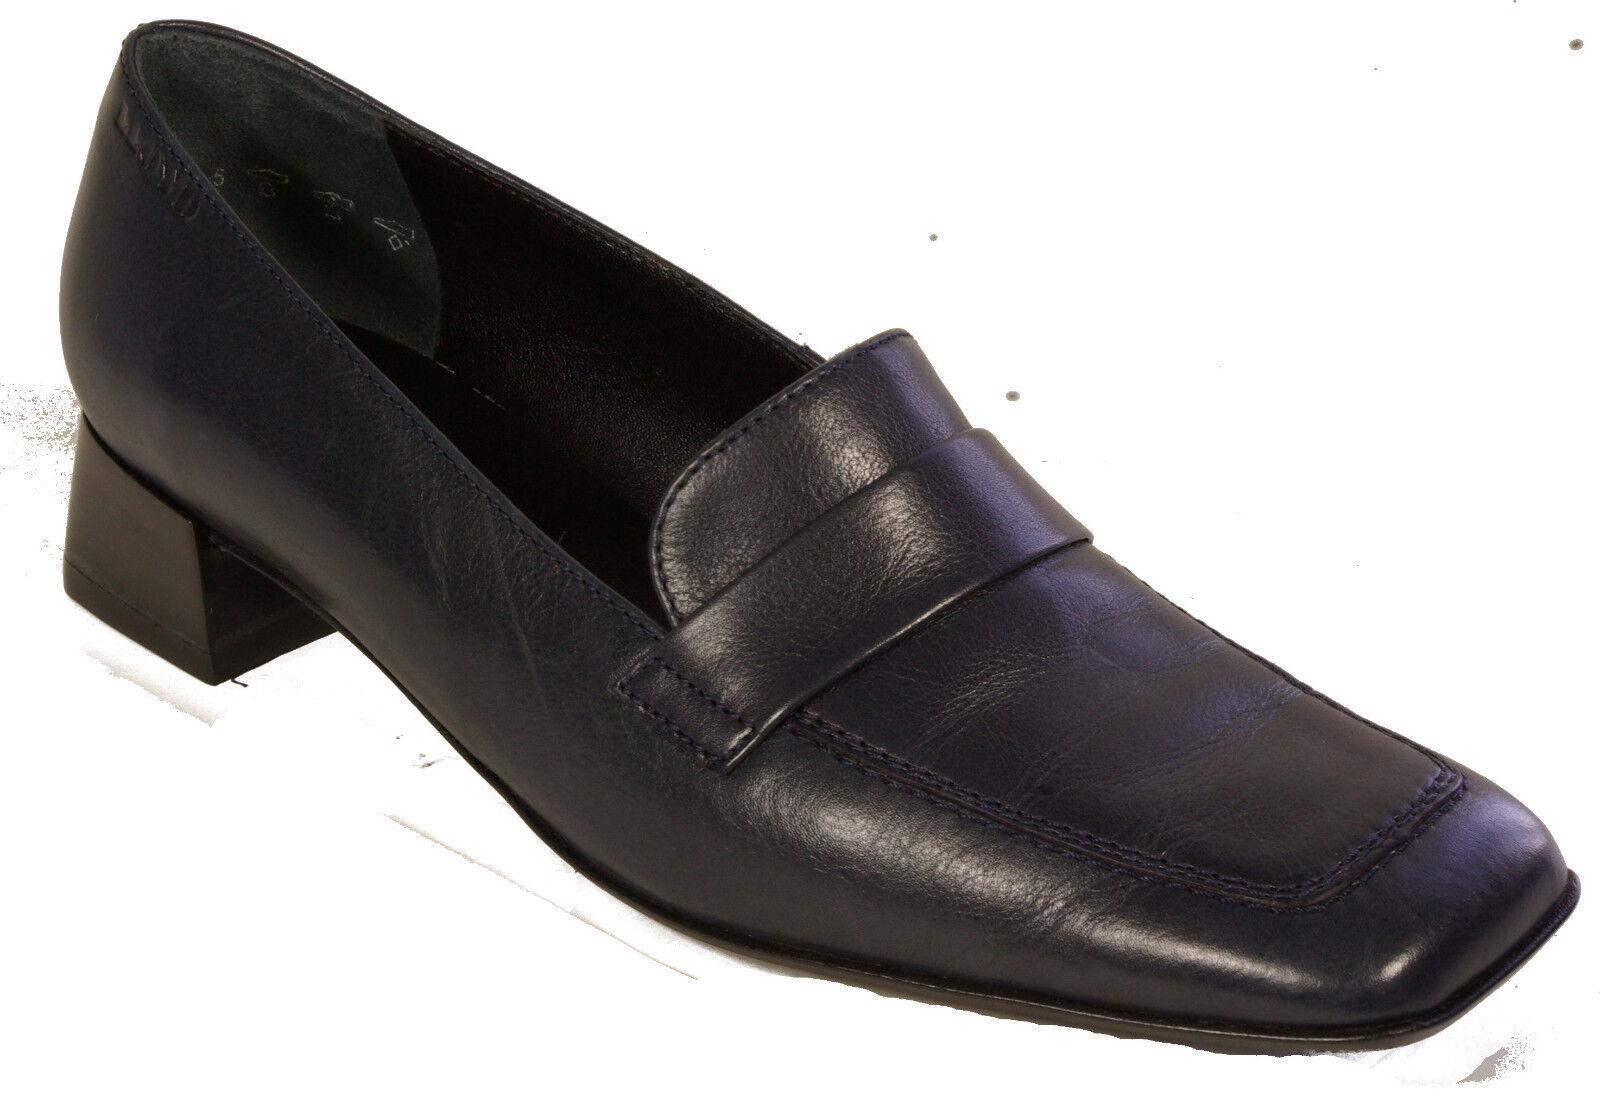 Lloyd Schuhe blau Pumps College Gr. 36 ( 3,5 ) blau Schuhe echt Leder  NEU 616ac4